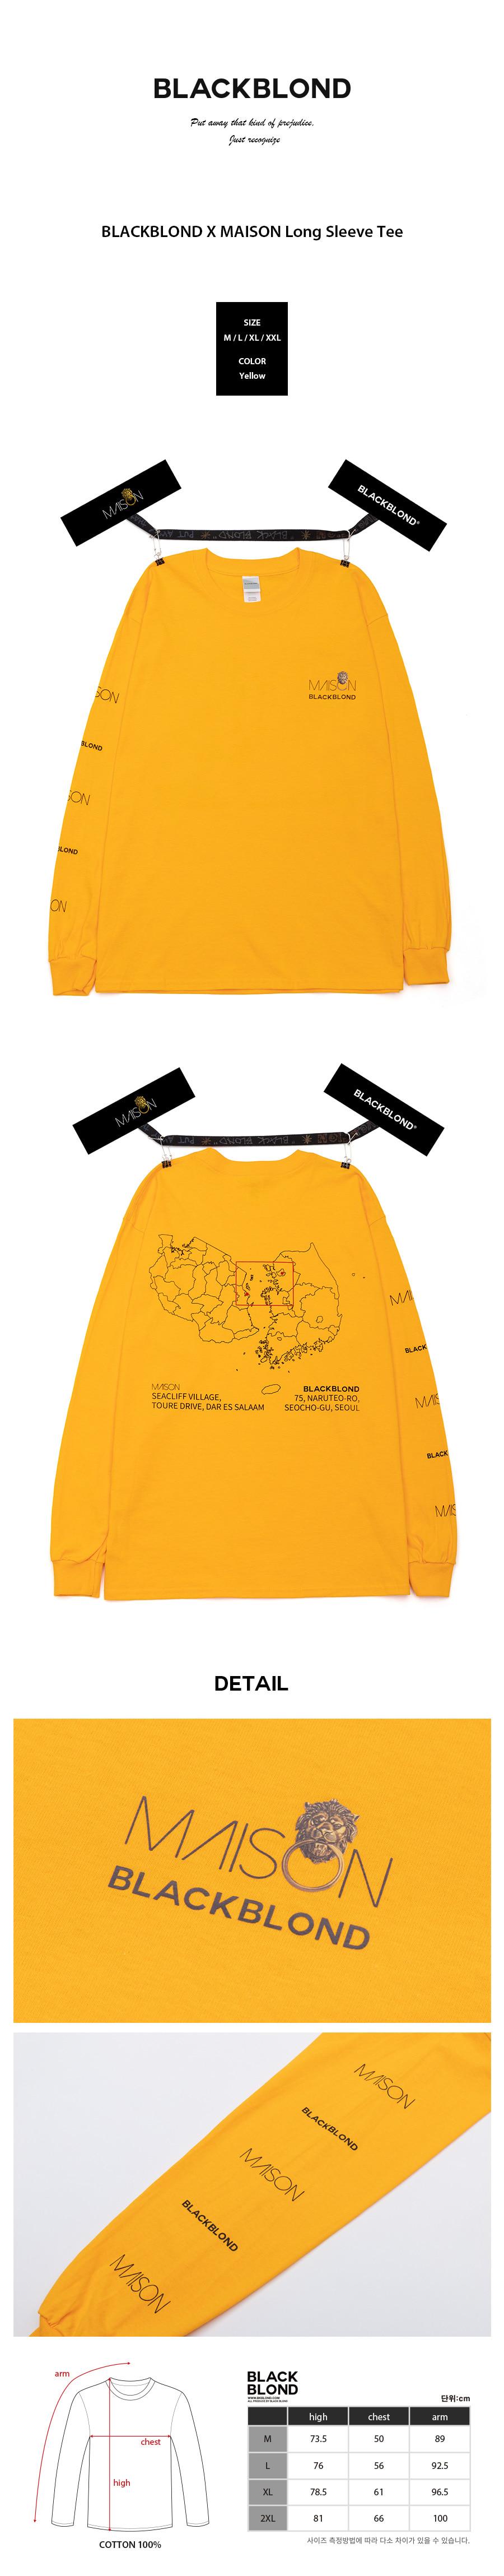 BLACKBLOND - BLACKBLOND x MAISON Long Sleeve Tee (Yellow)